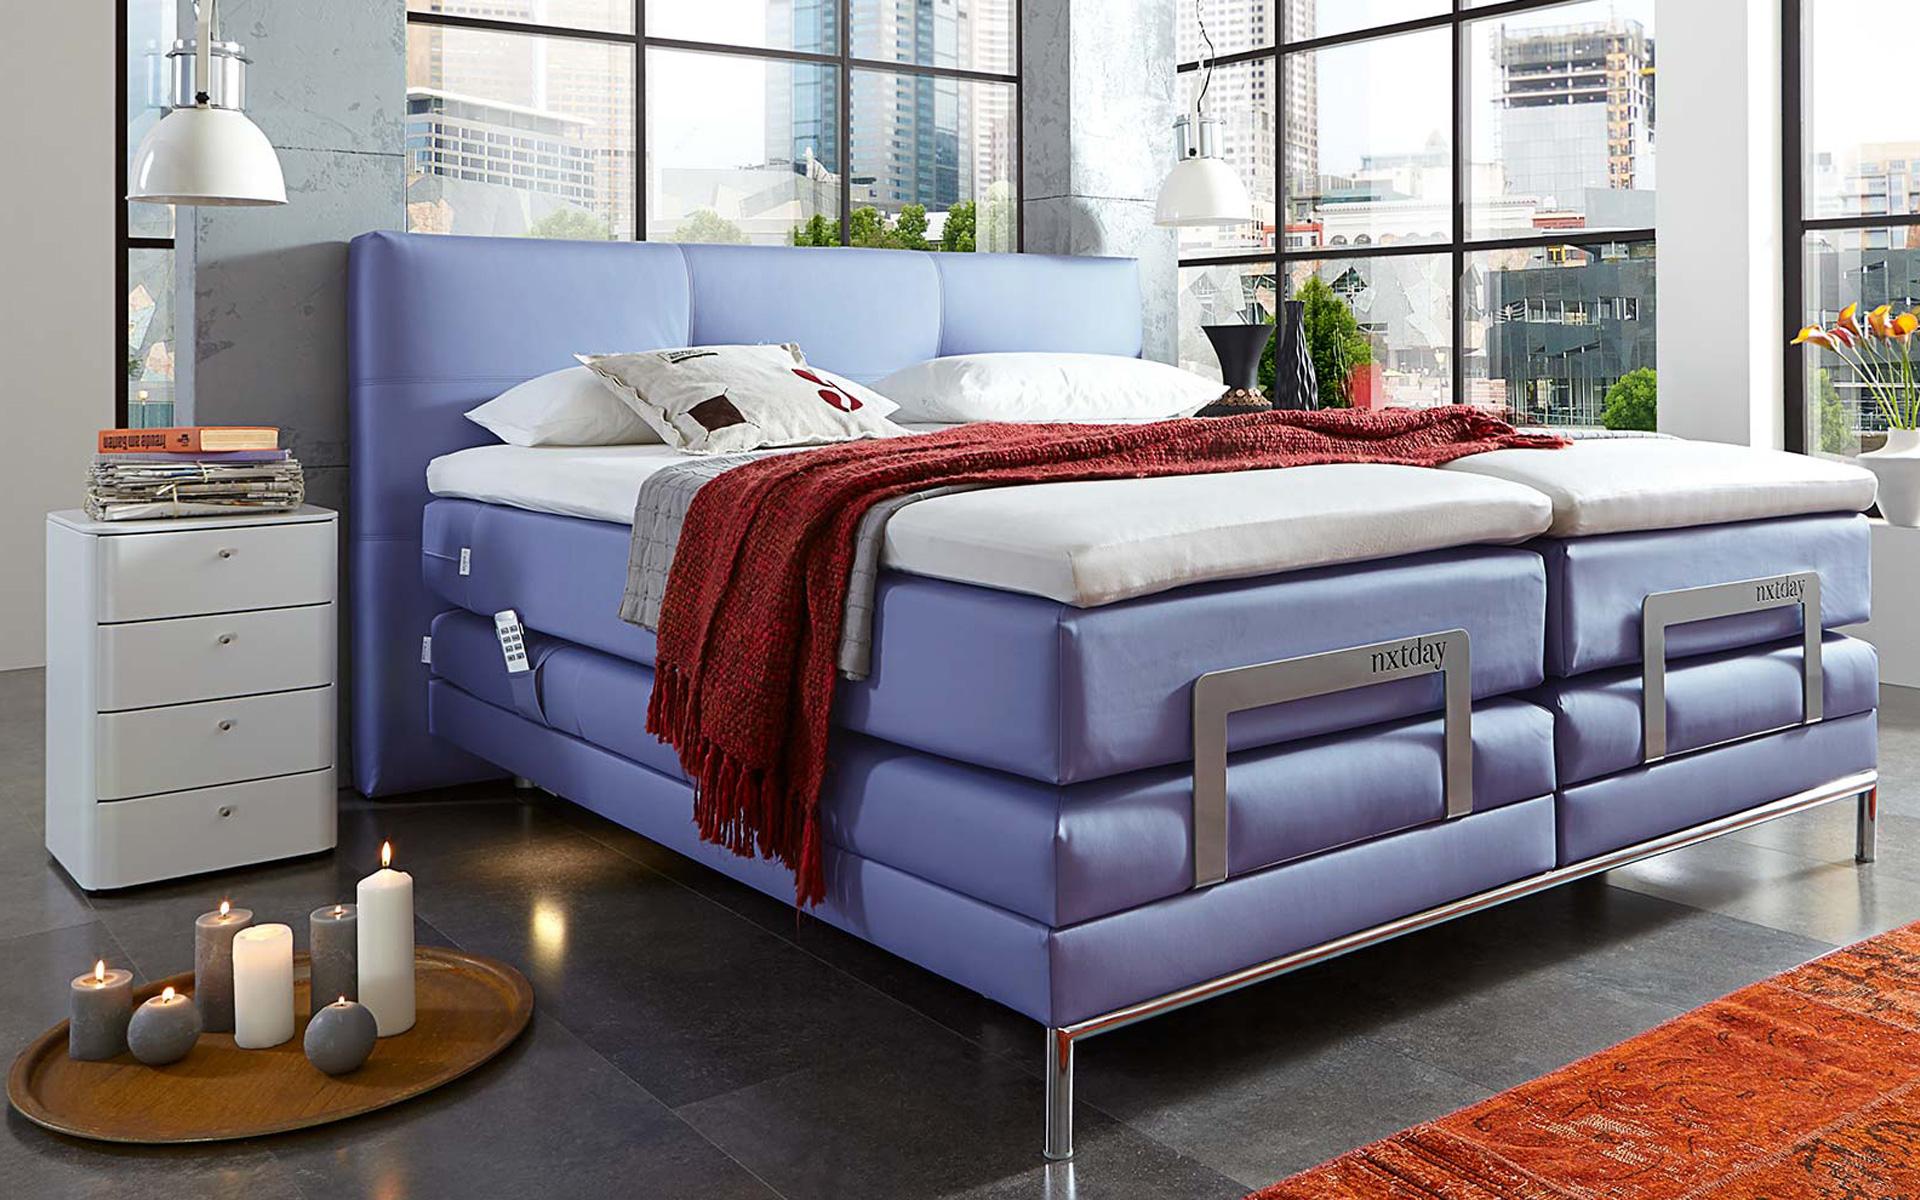 carpe diem betten munchen boxspring betten galerie wohndesign freising. Black Bedroom Furniture Sets. Home Design Ideas